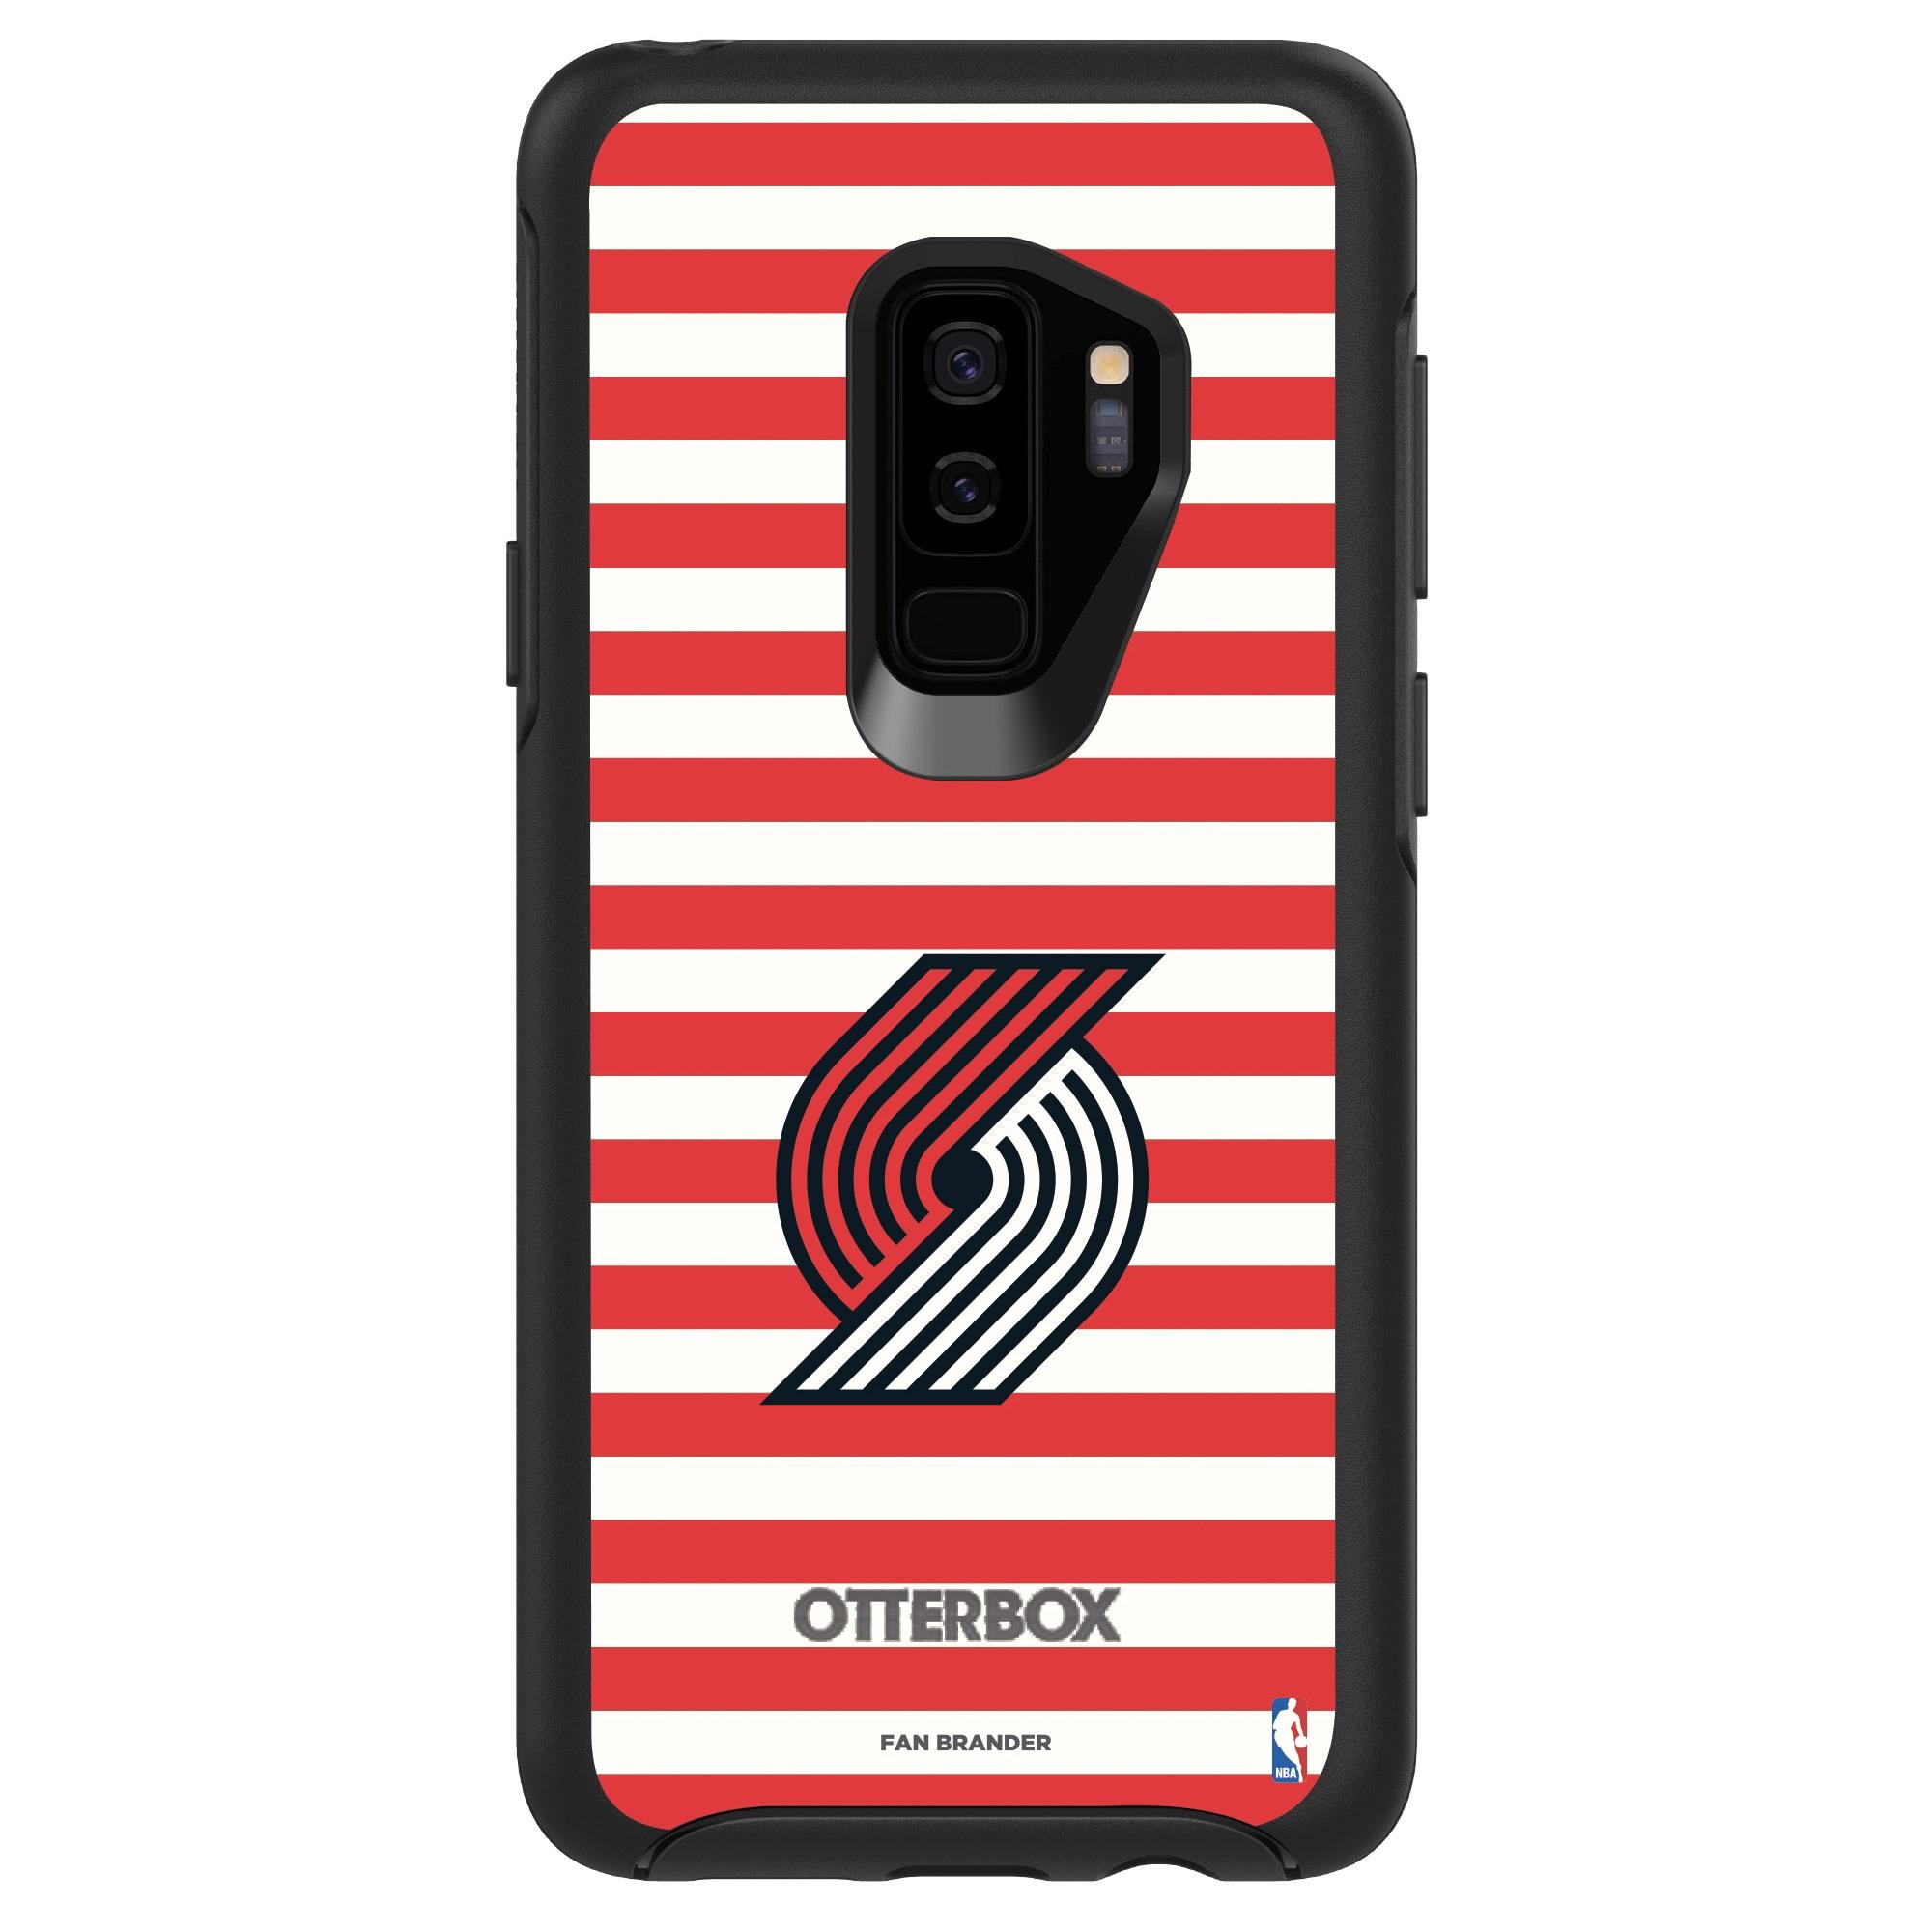 Portland Trail Blazers OtterBox Galaxy Symmetry Striped Design Case